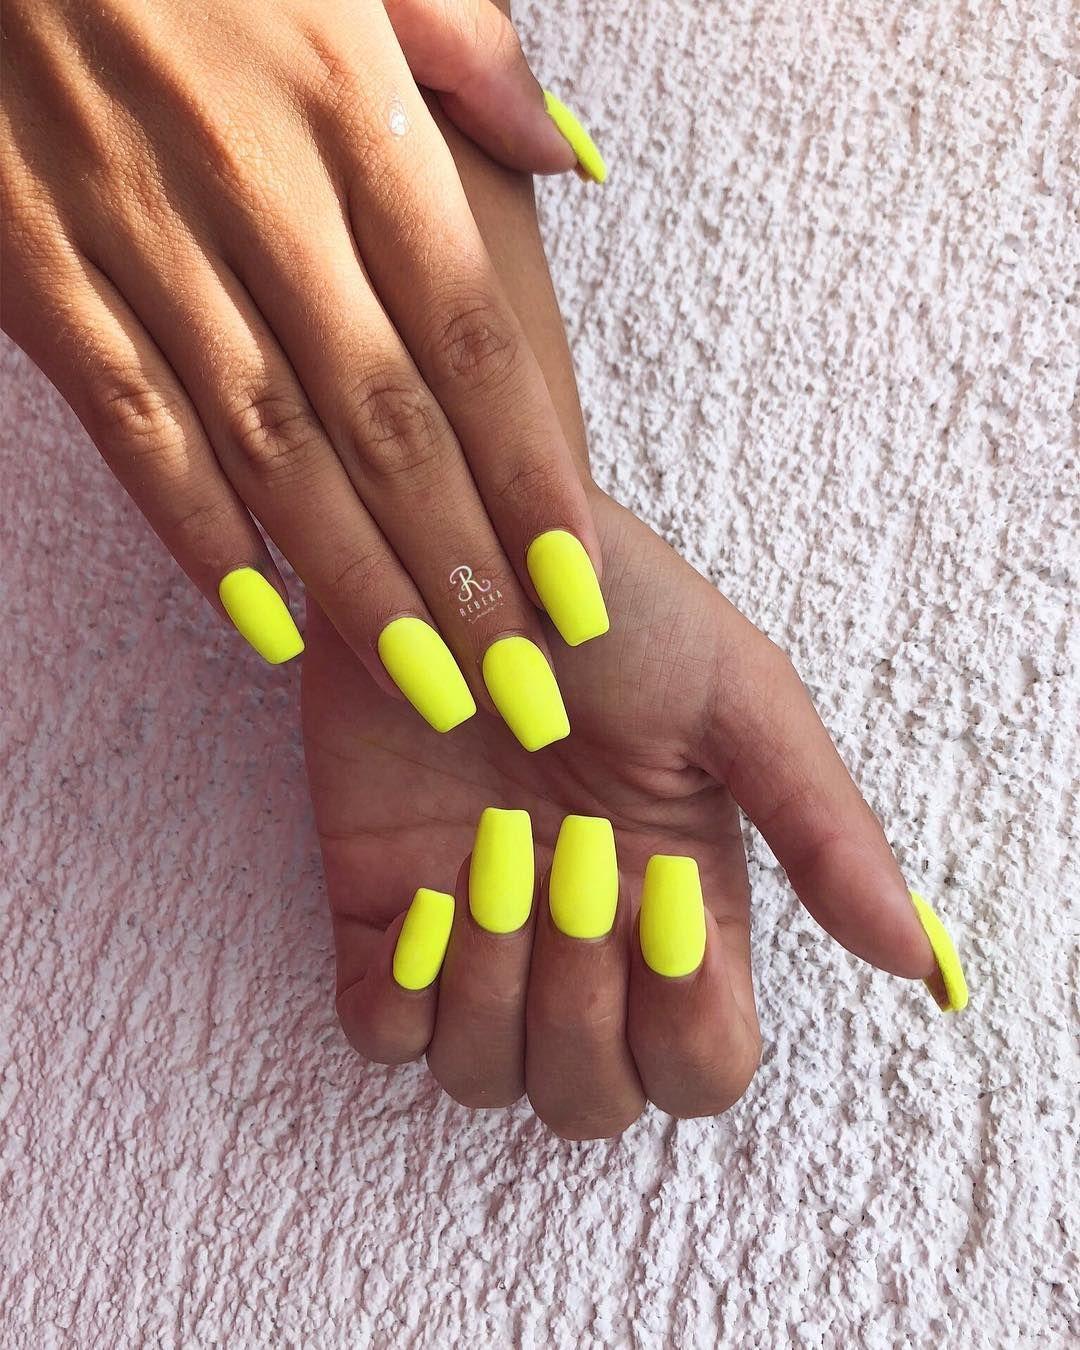 Yellow Nails Nail Nailart Neon Neonnailsummer Neonnails Summer Summernails Summerday Summervibes Summer Summerti With Images Gelove Nehty Nehty Nehty Stiletto